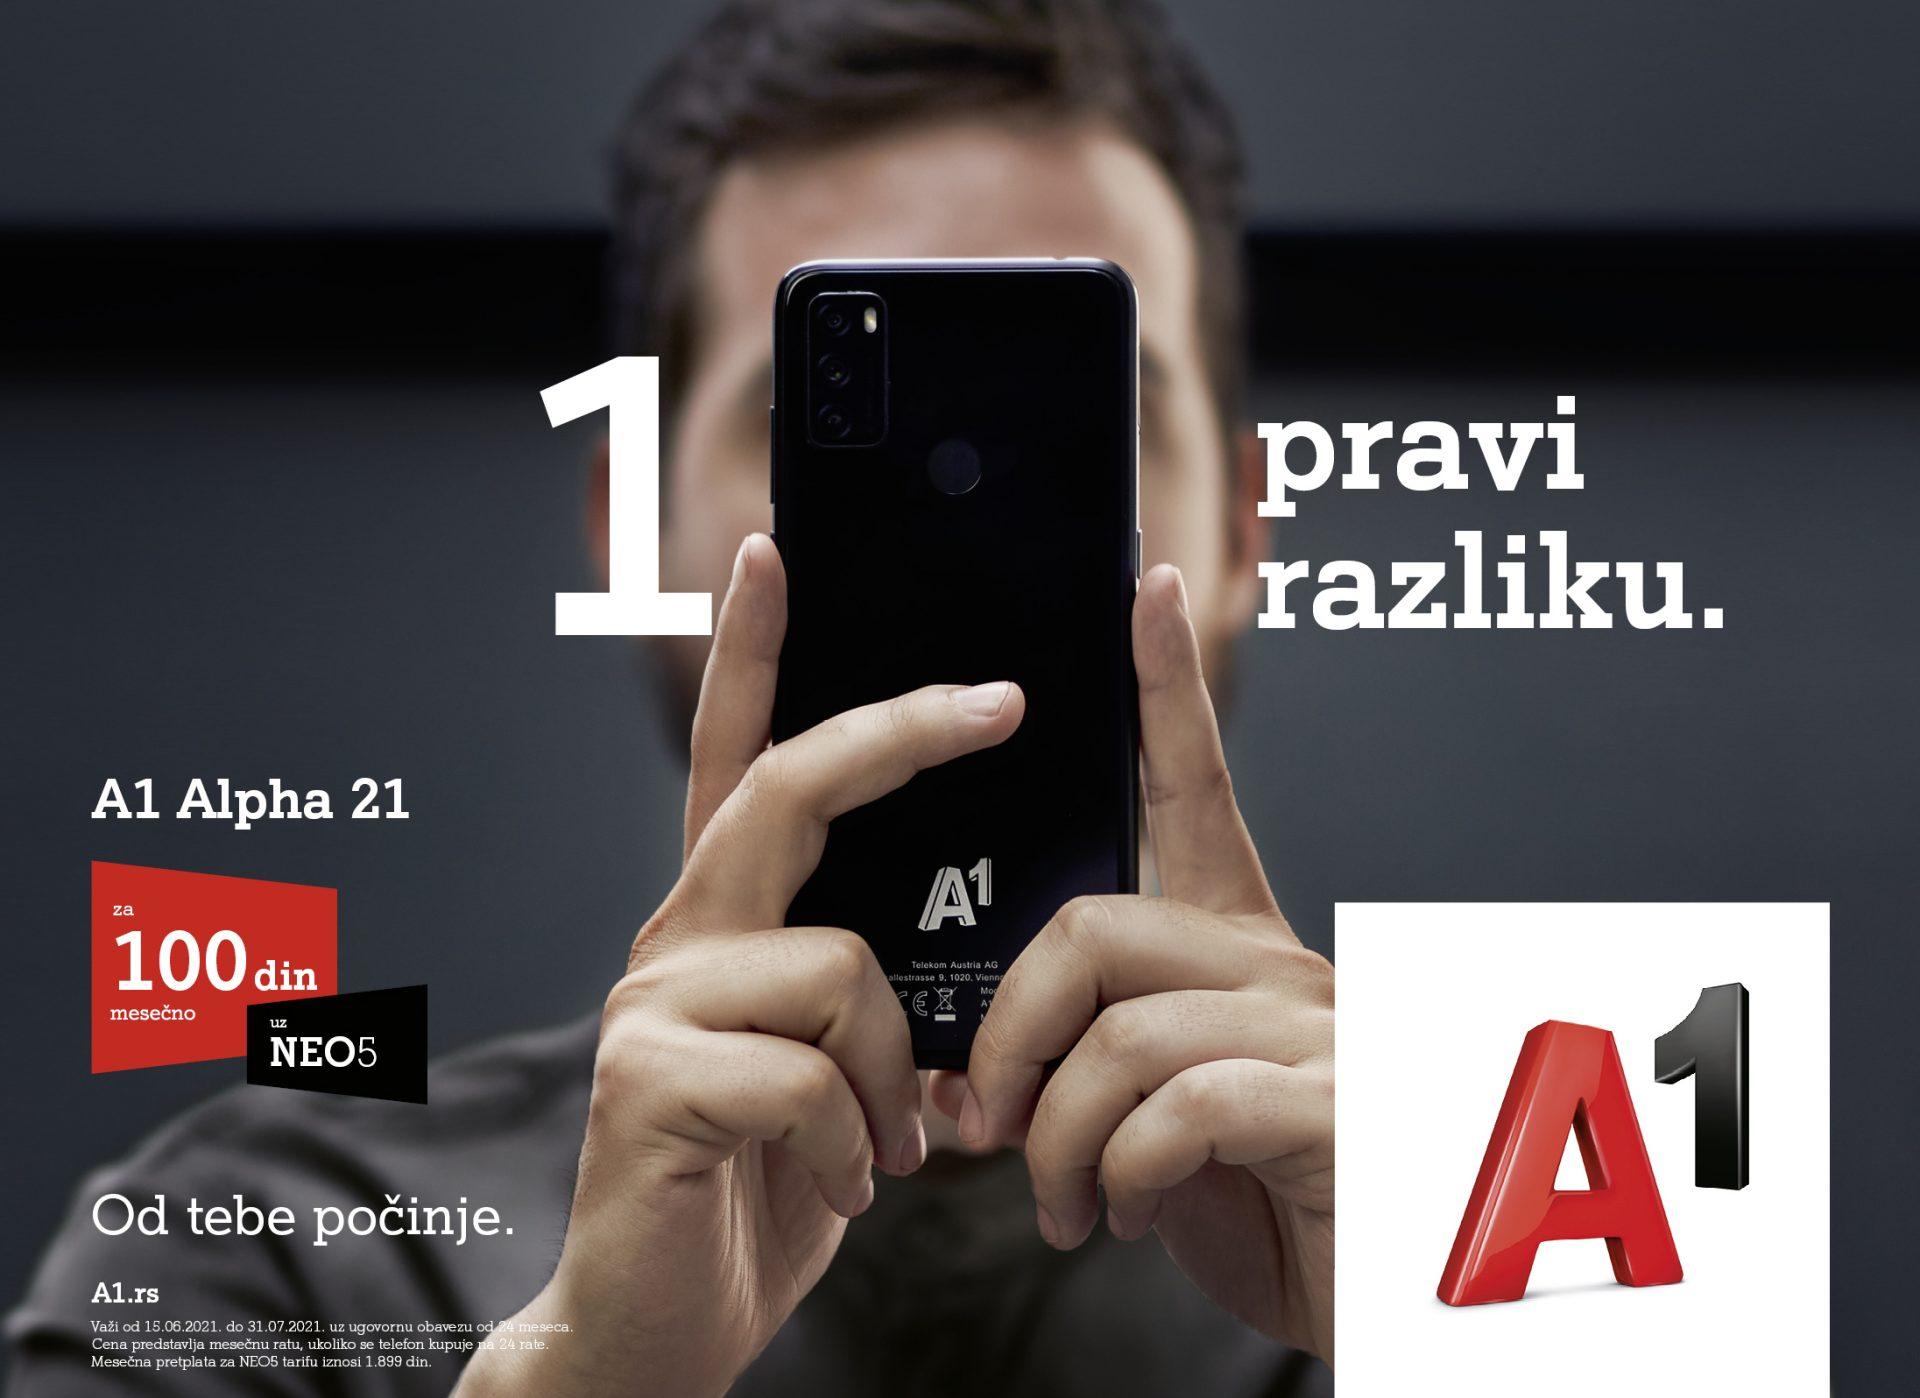 A1_HW Resi_Backlight 4x3_02